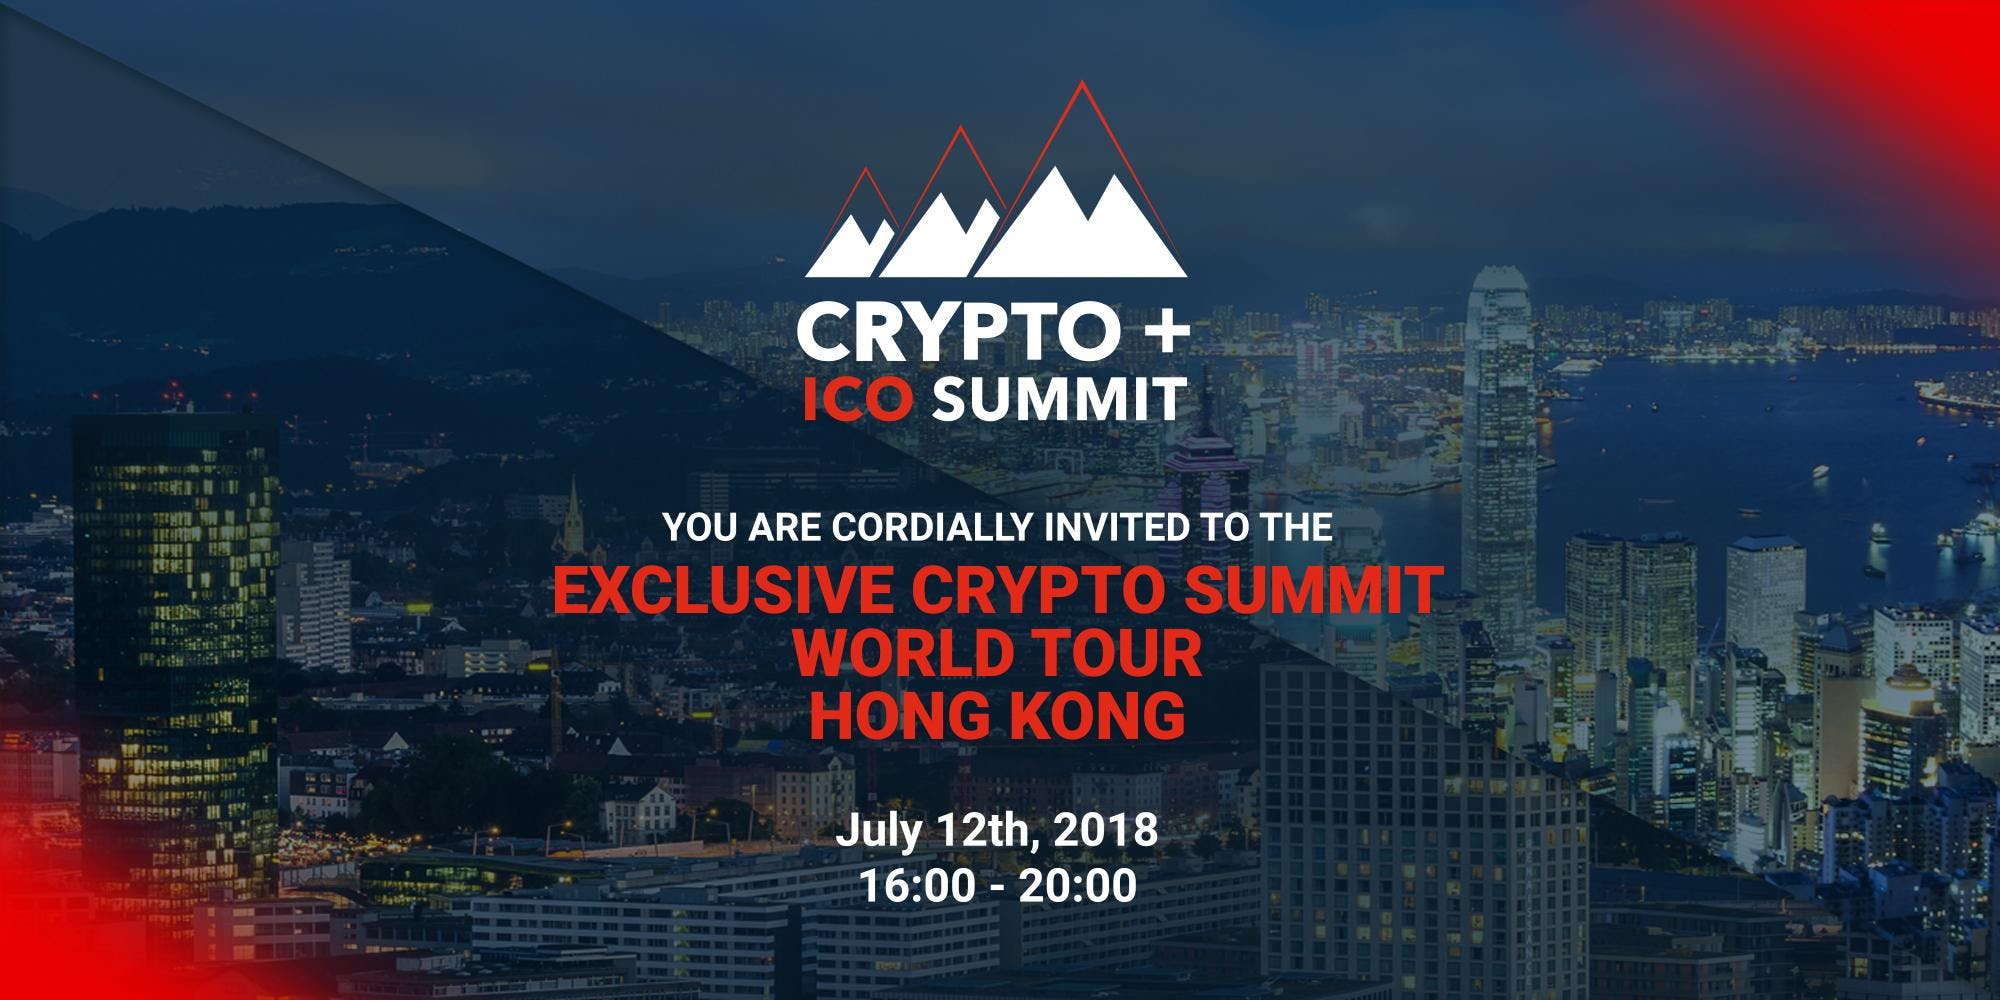 Exclusive Crypto Summit World Tour Hong Kong